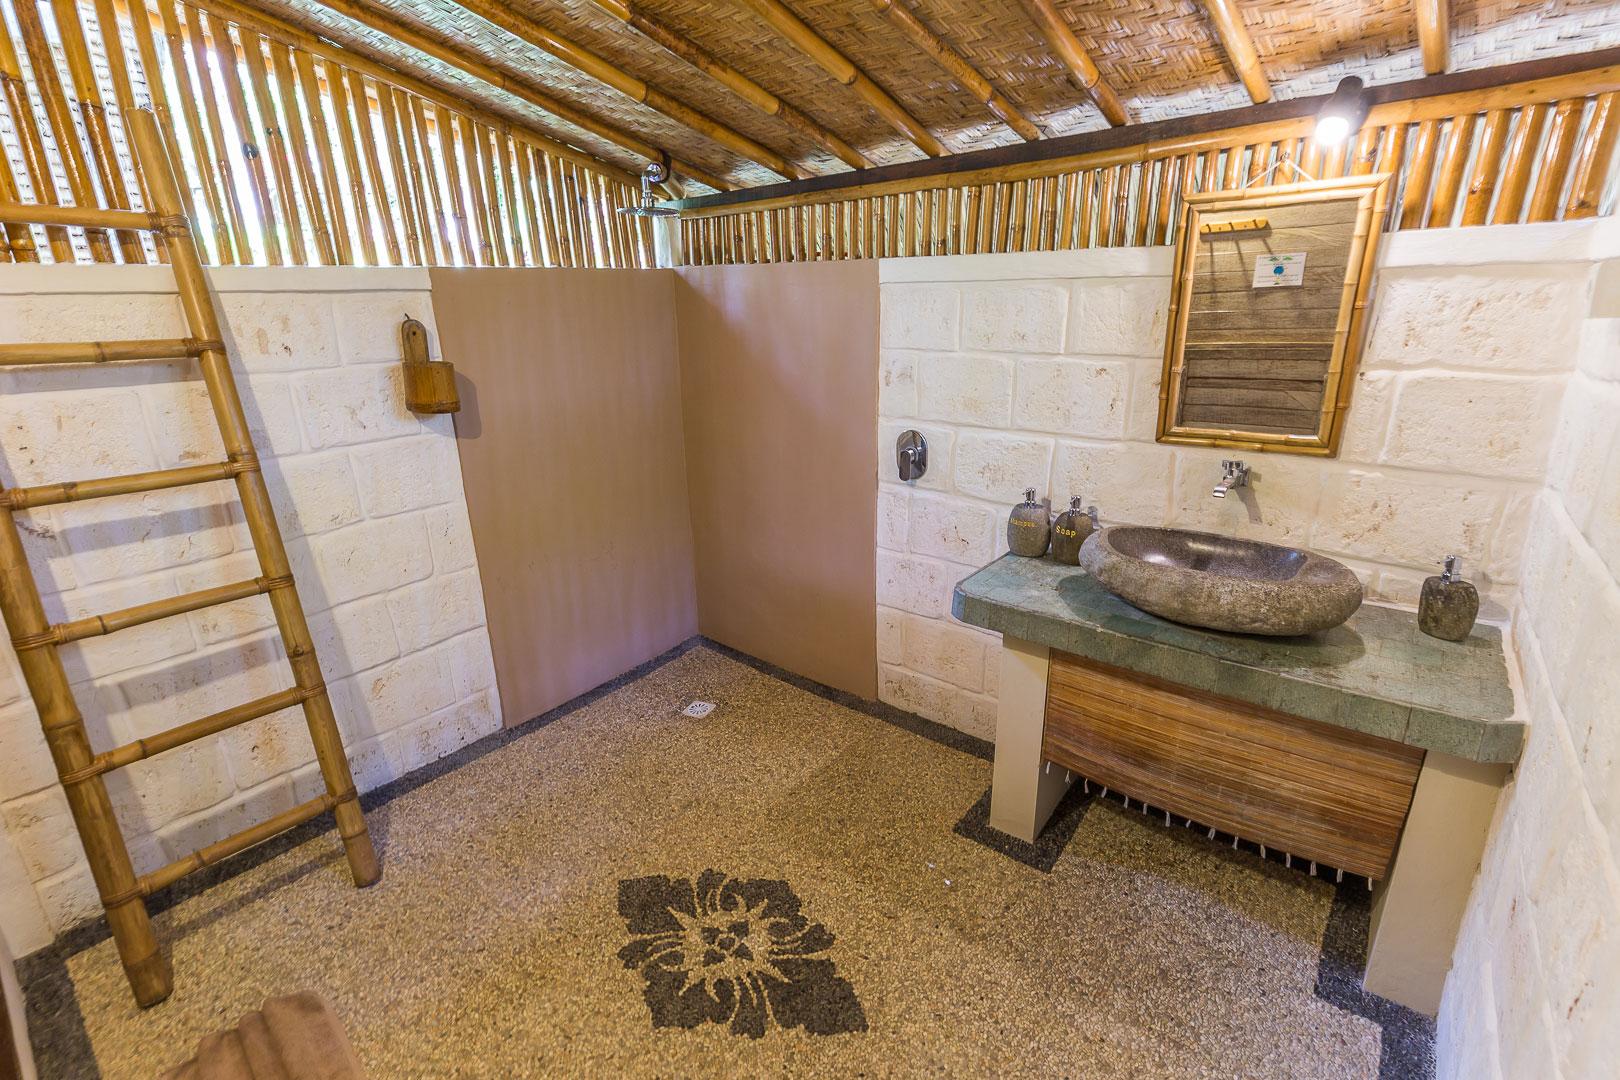 Location-bungalows-maison-hote-hotel-milos-home-L7-rhodochrosite-3